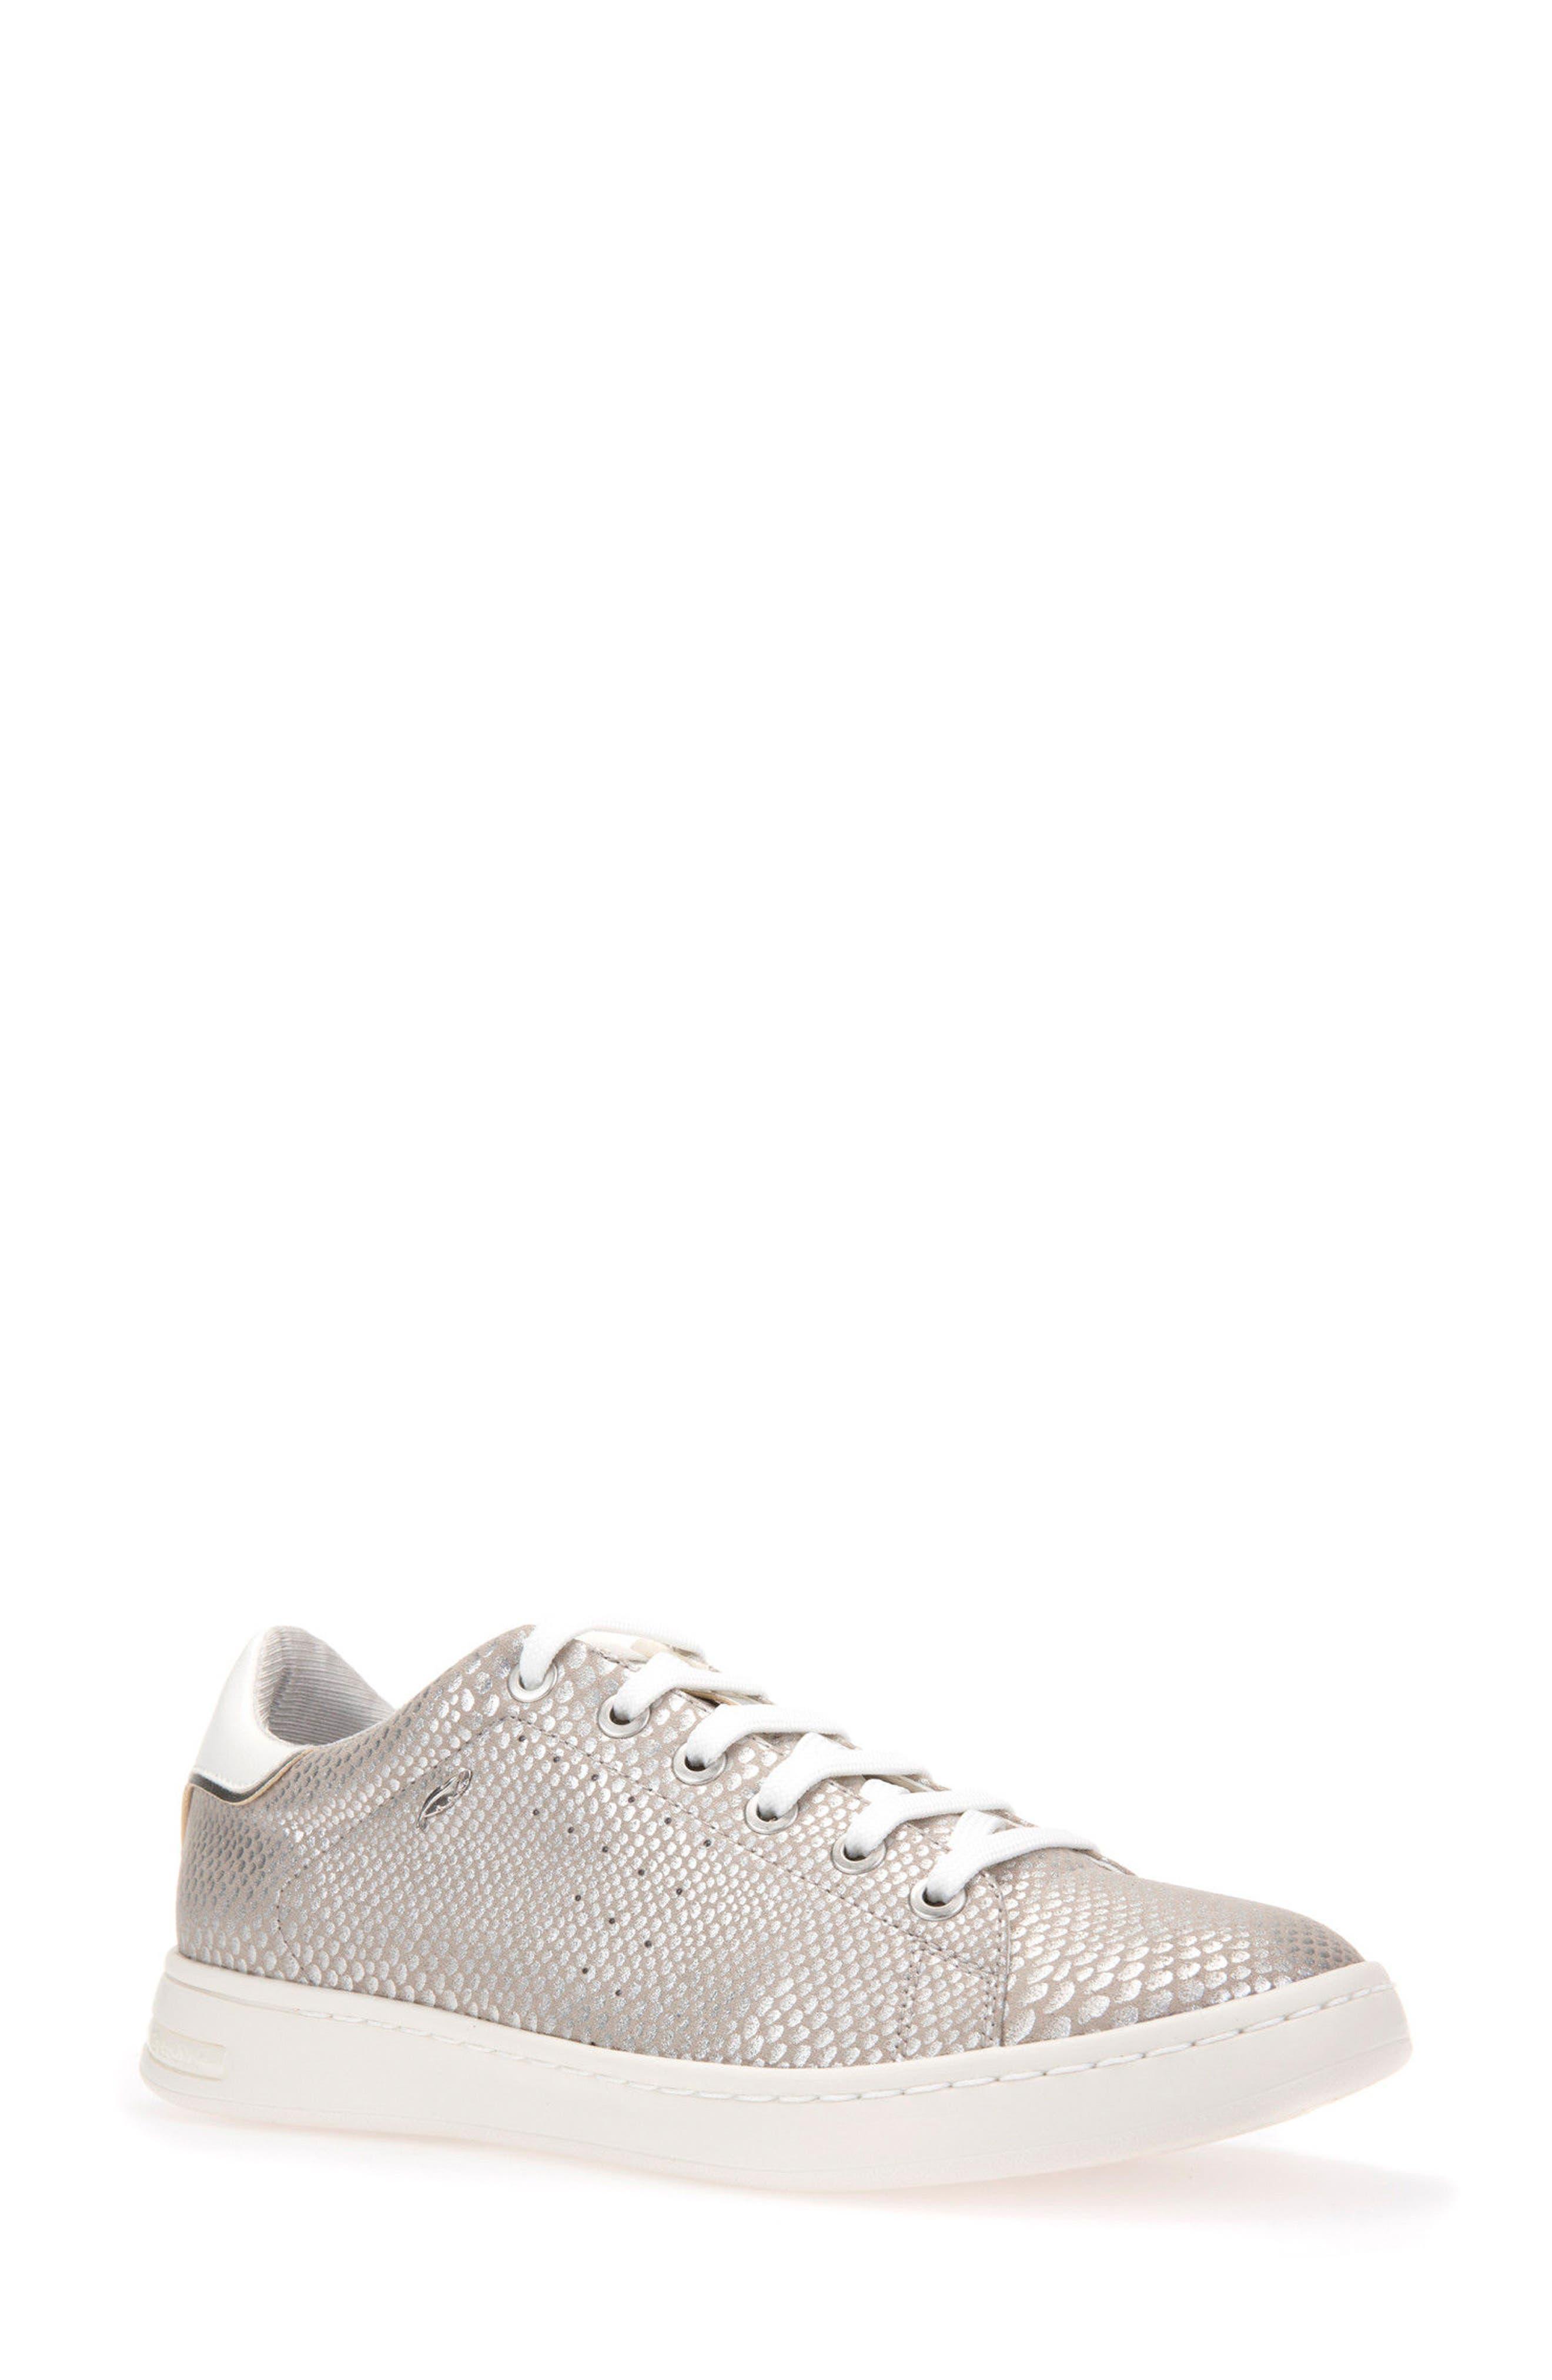 Jaysen Sneaker,                             Main thumbnail 1, color,                             SILVER FABRIC